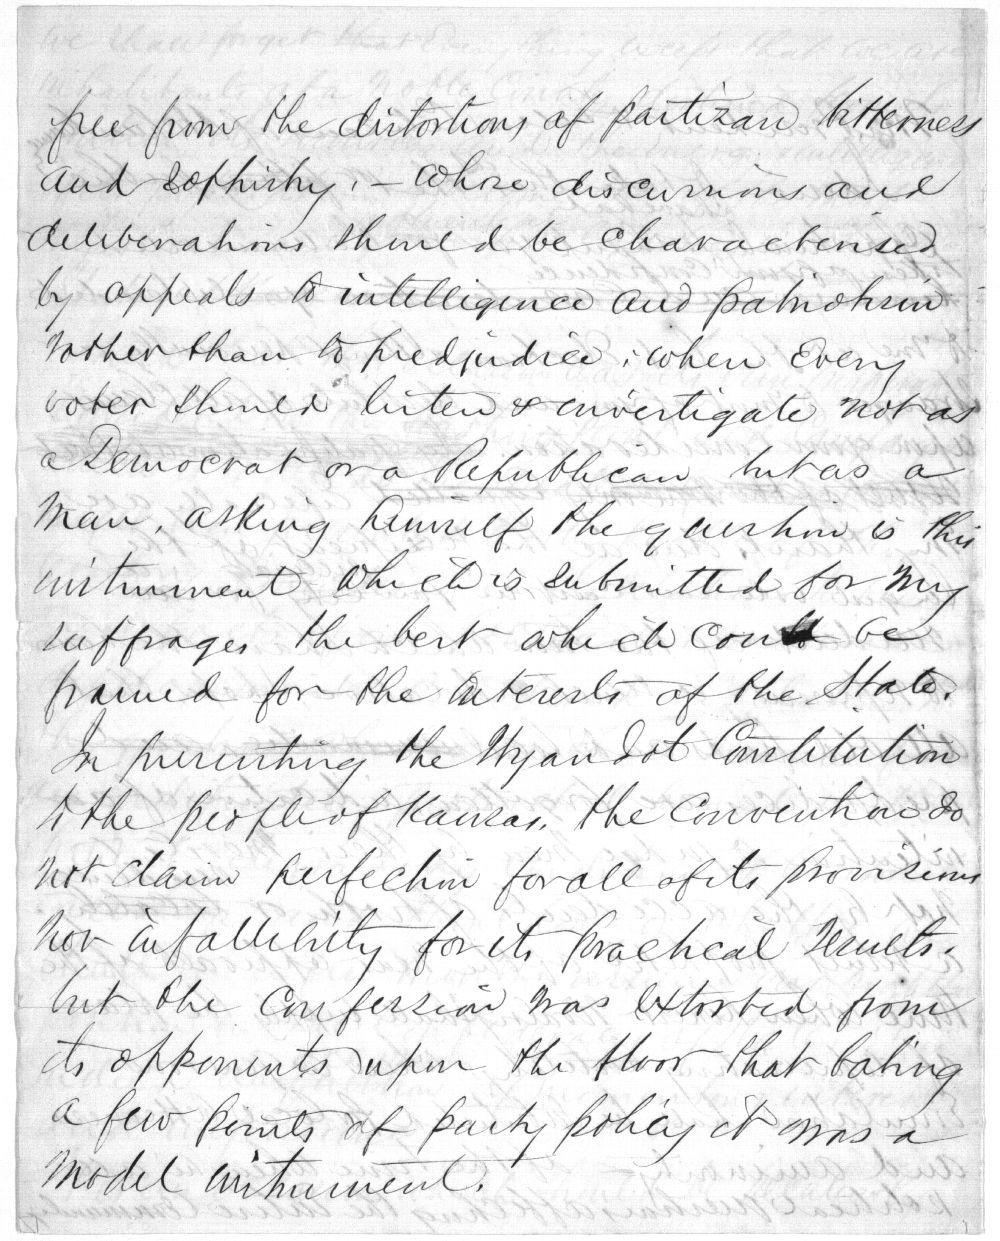 Speech written by John J. Ingalls - 3